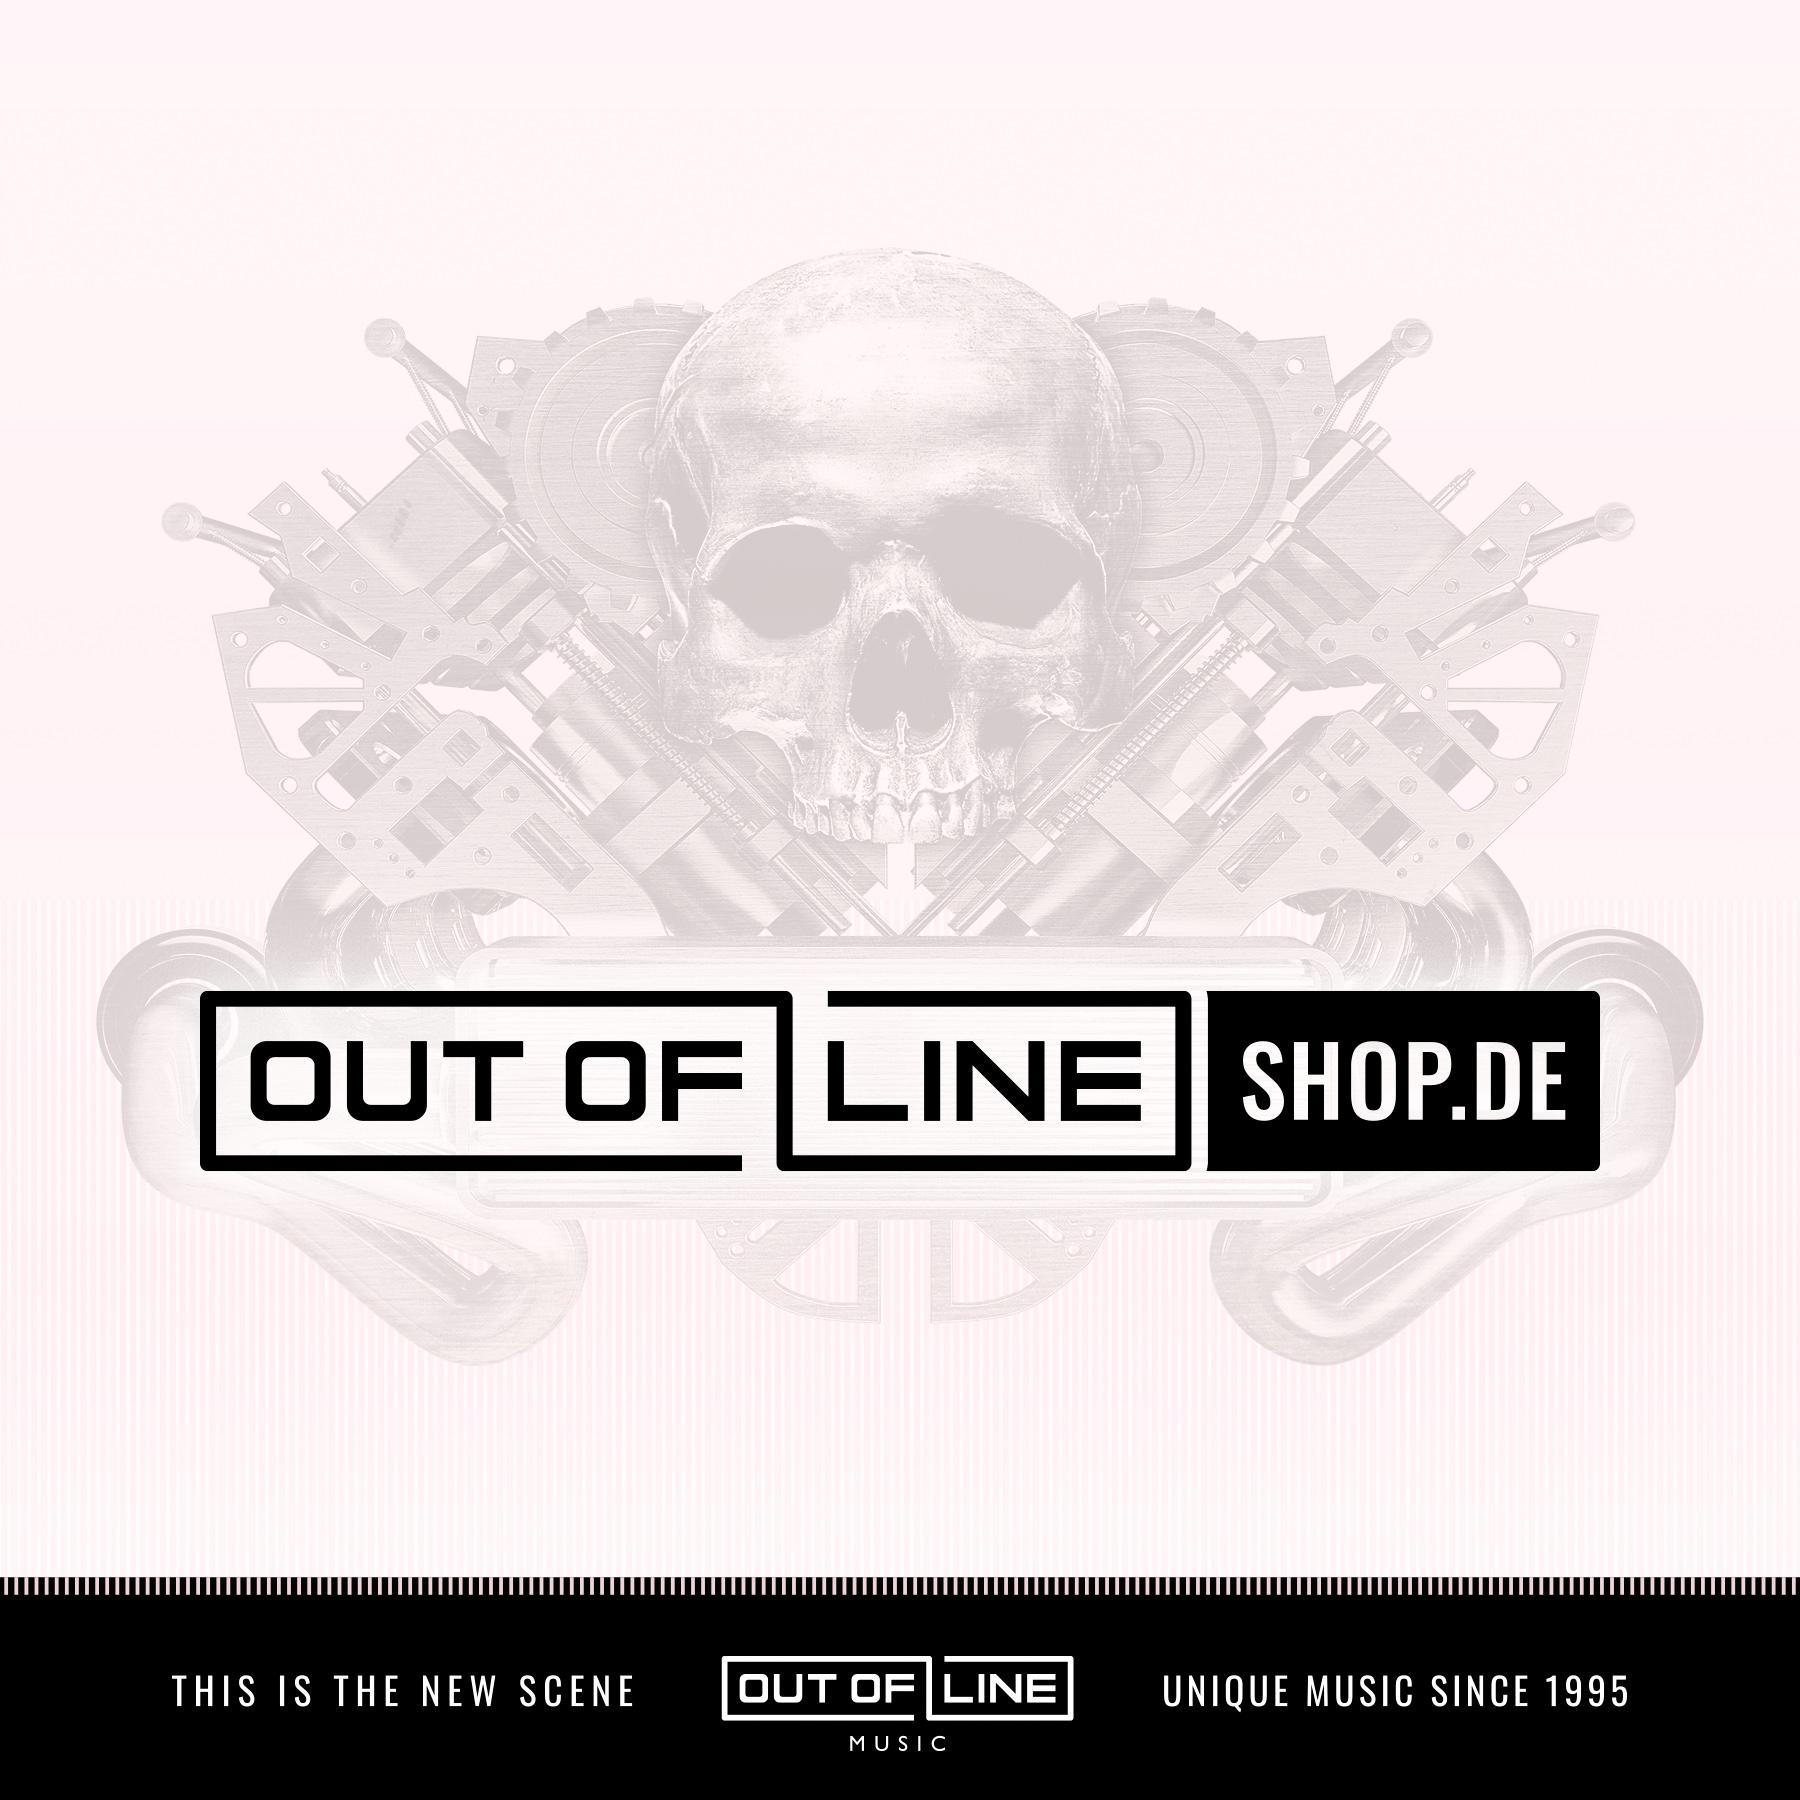 V.A. - Projekt Neue Ordnung II (Limited Edition) - 4LP BOX